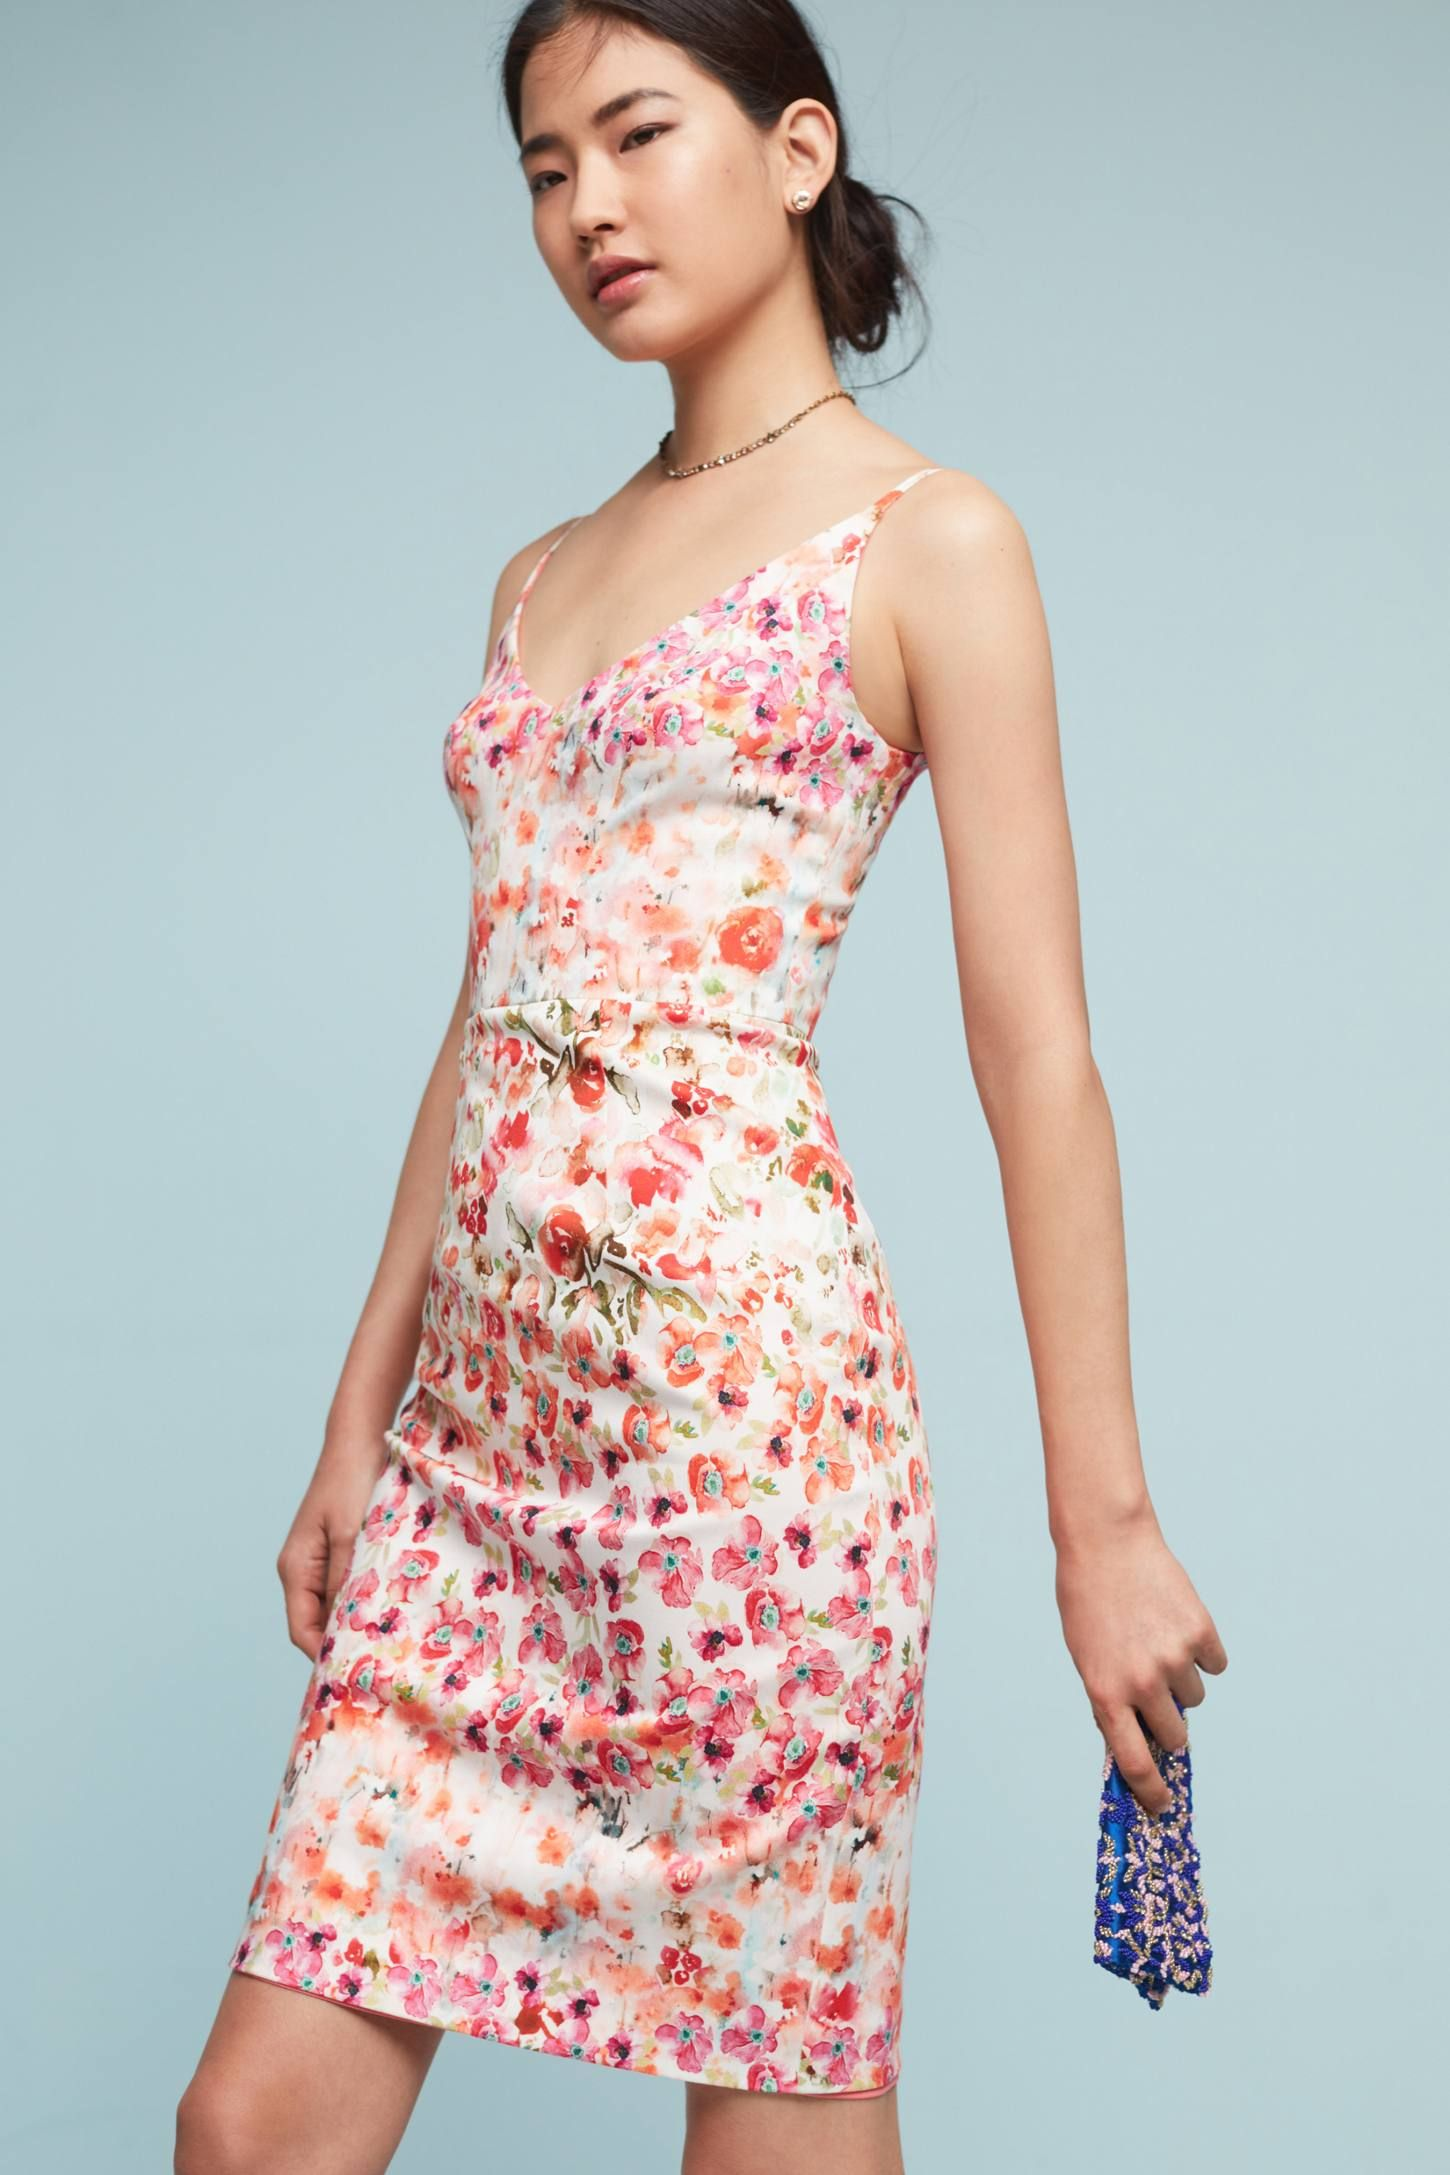 All In Bloom Sheath Dress